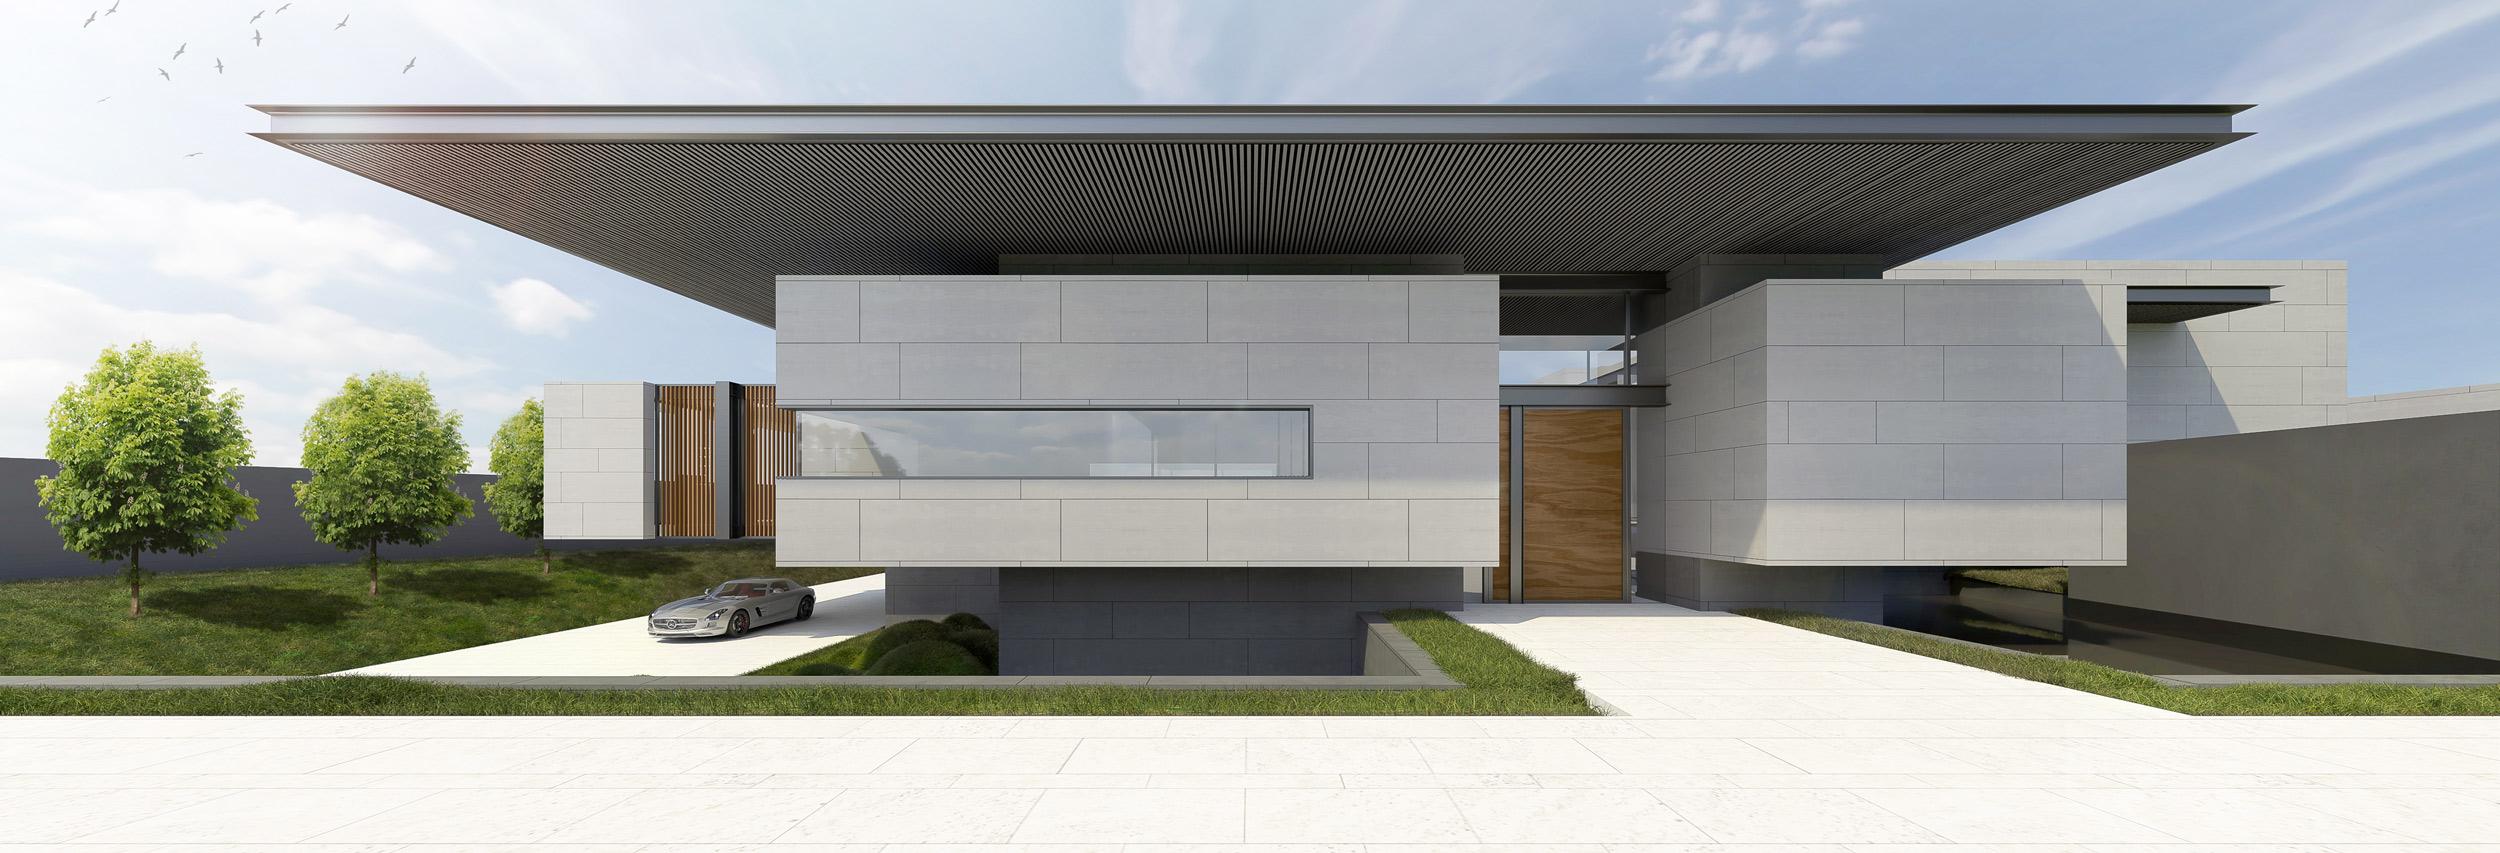 echmiadzin-house-armenia-archillusion-design-artur-nesterenko-09.jpg